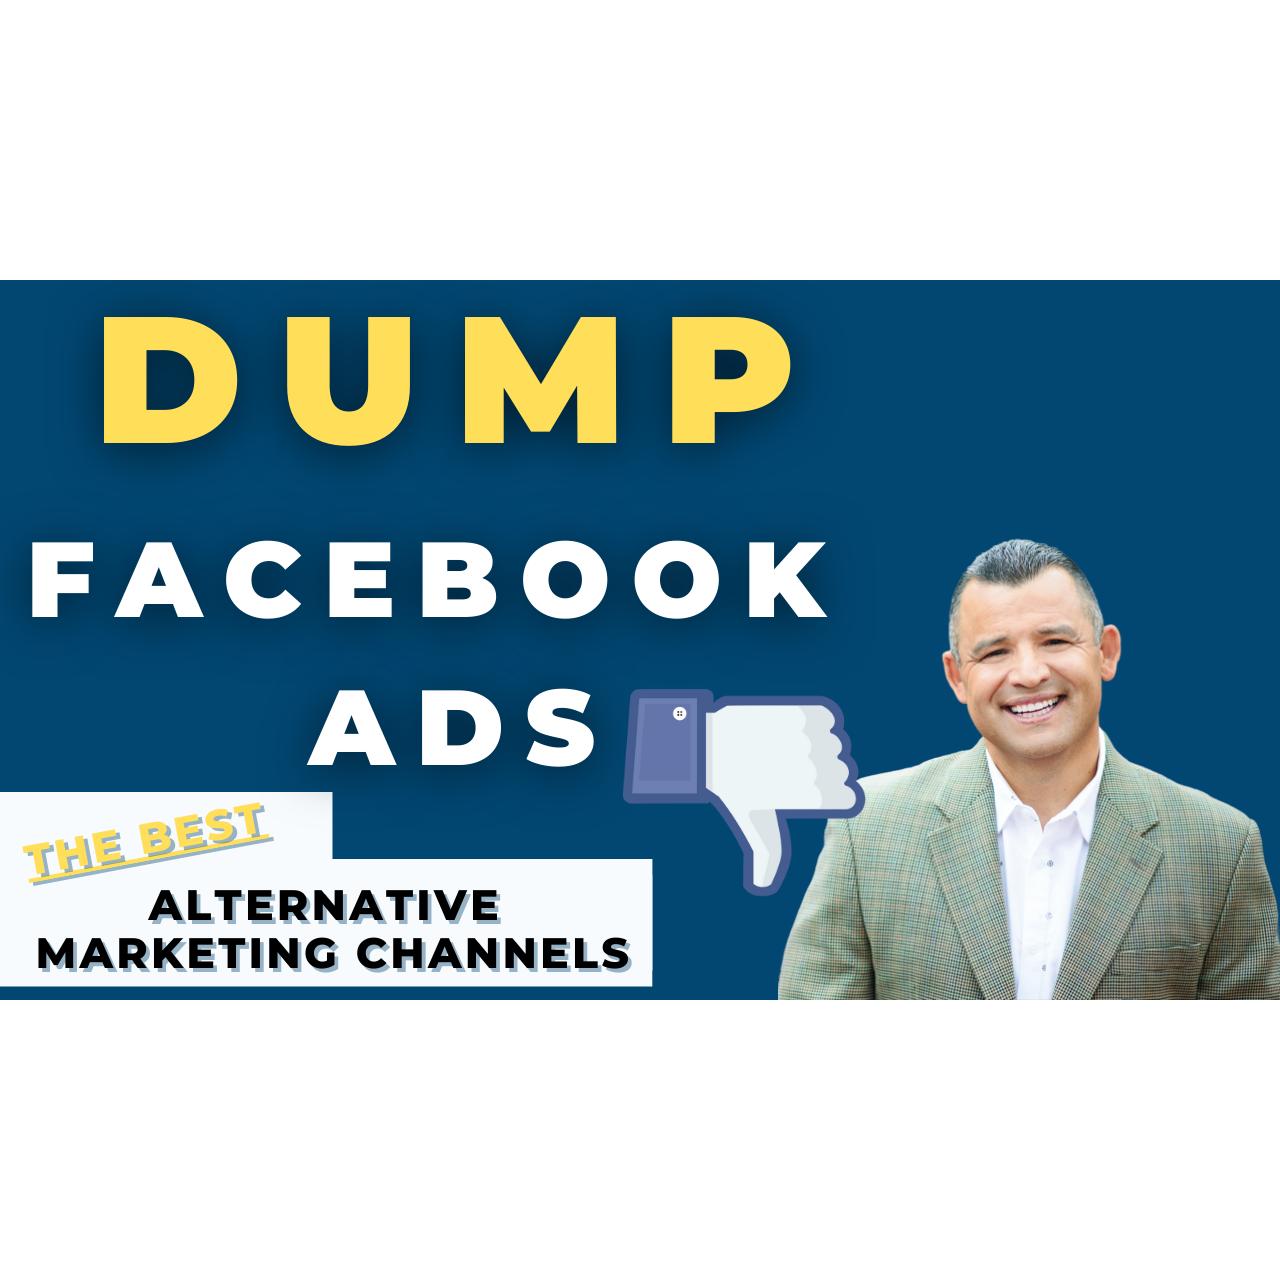 Dump FaceBook Ads - The Best Alternative Marketing Channels